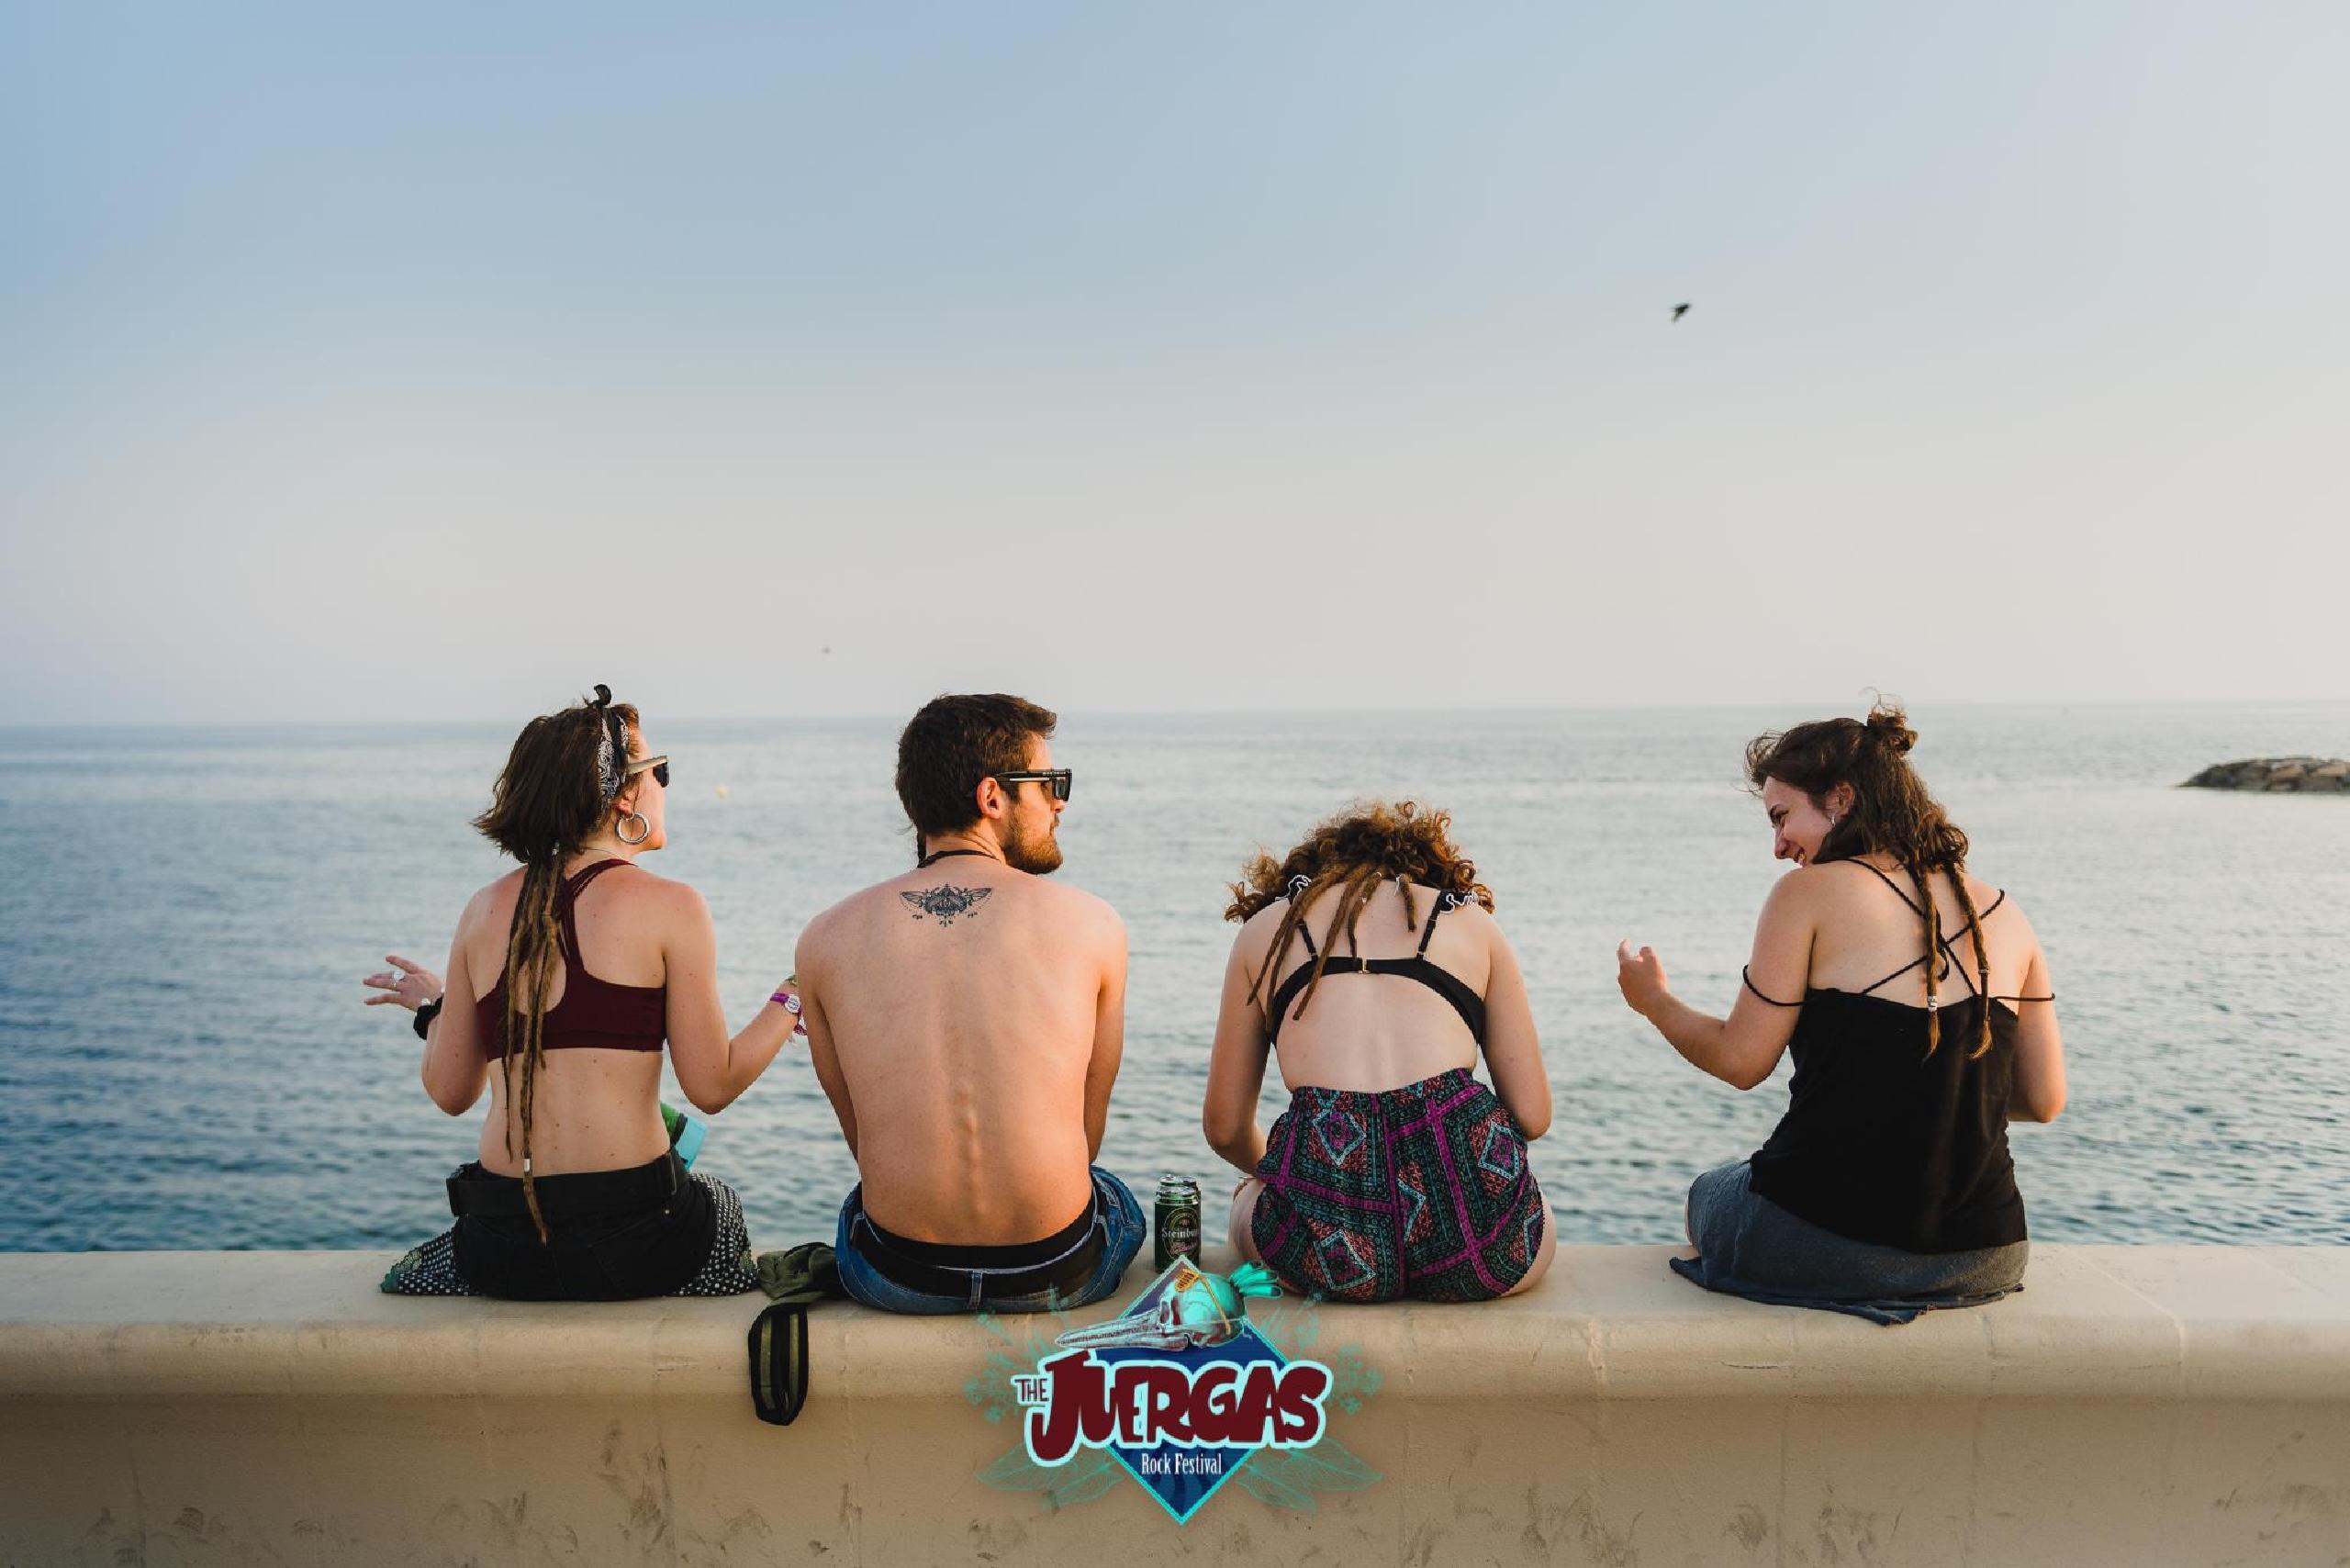 Foto de The juergas Rock Festival